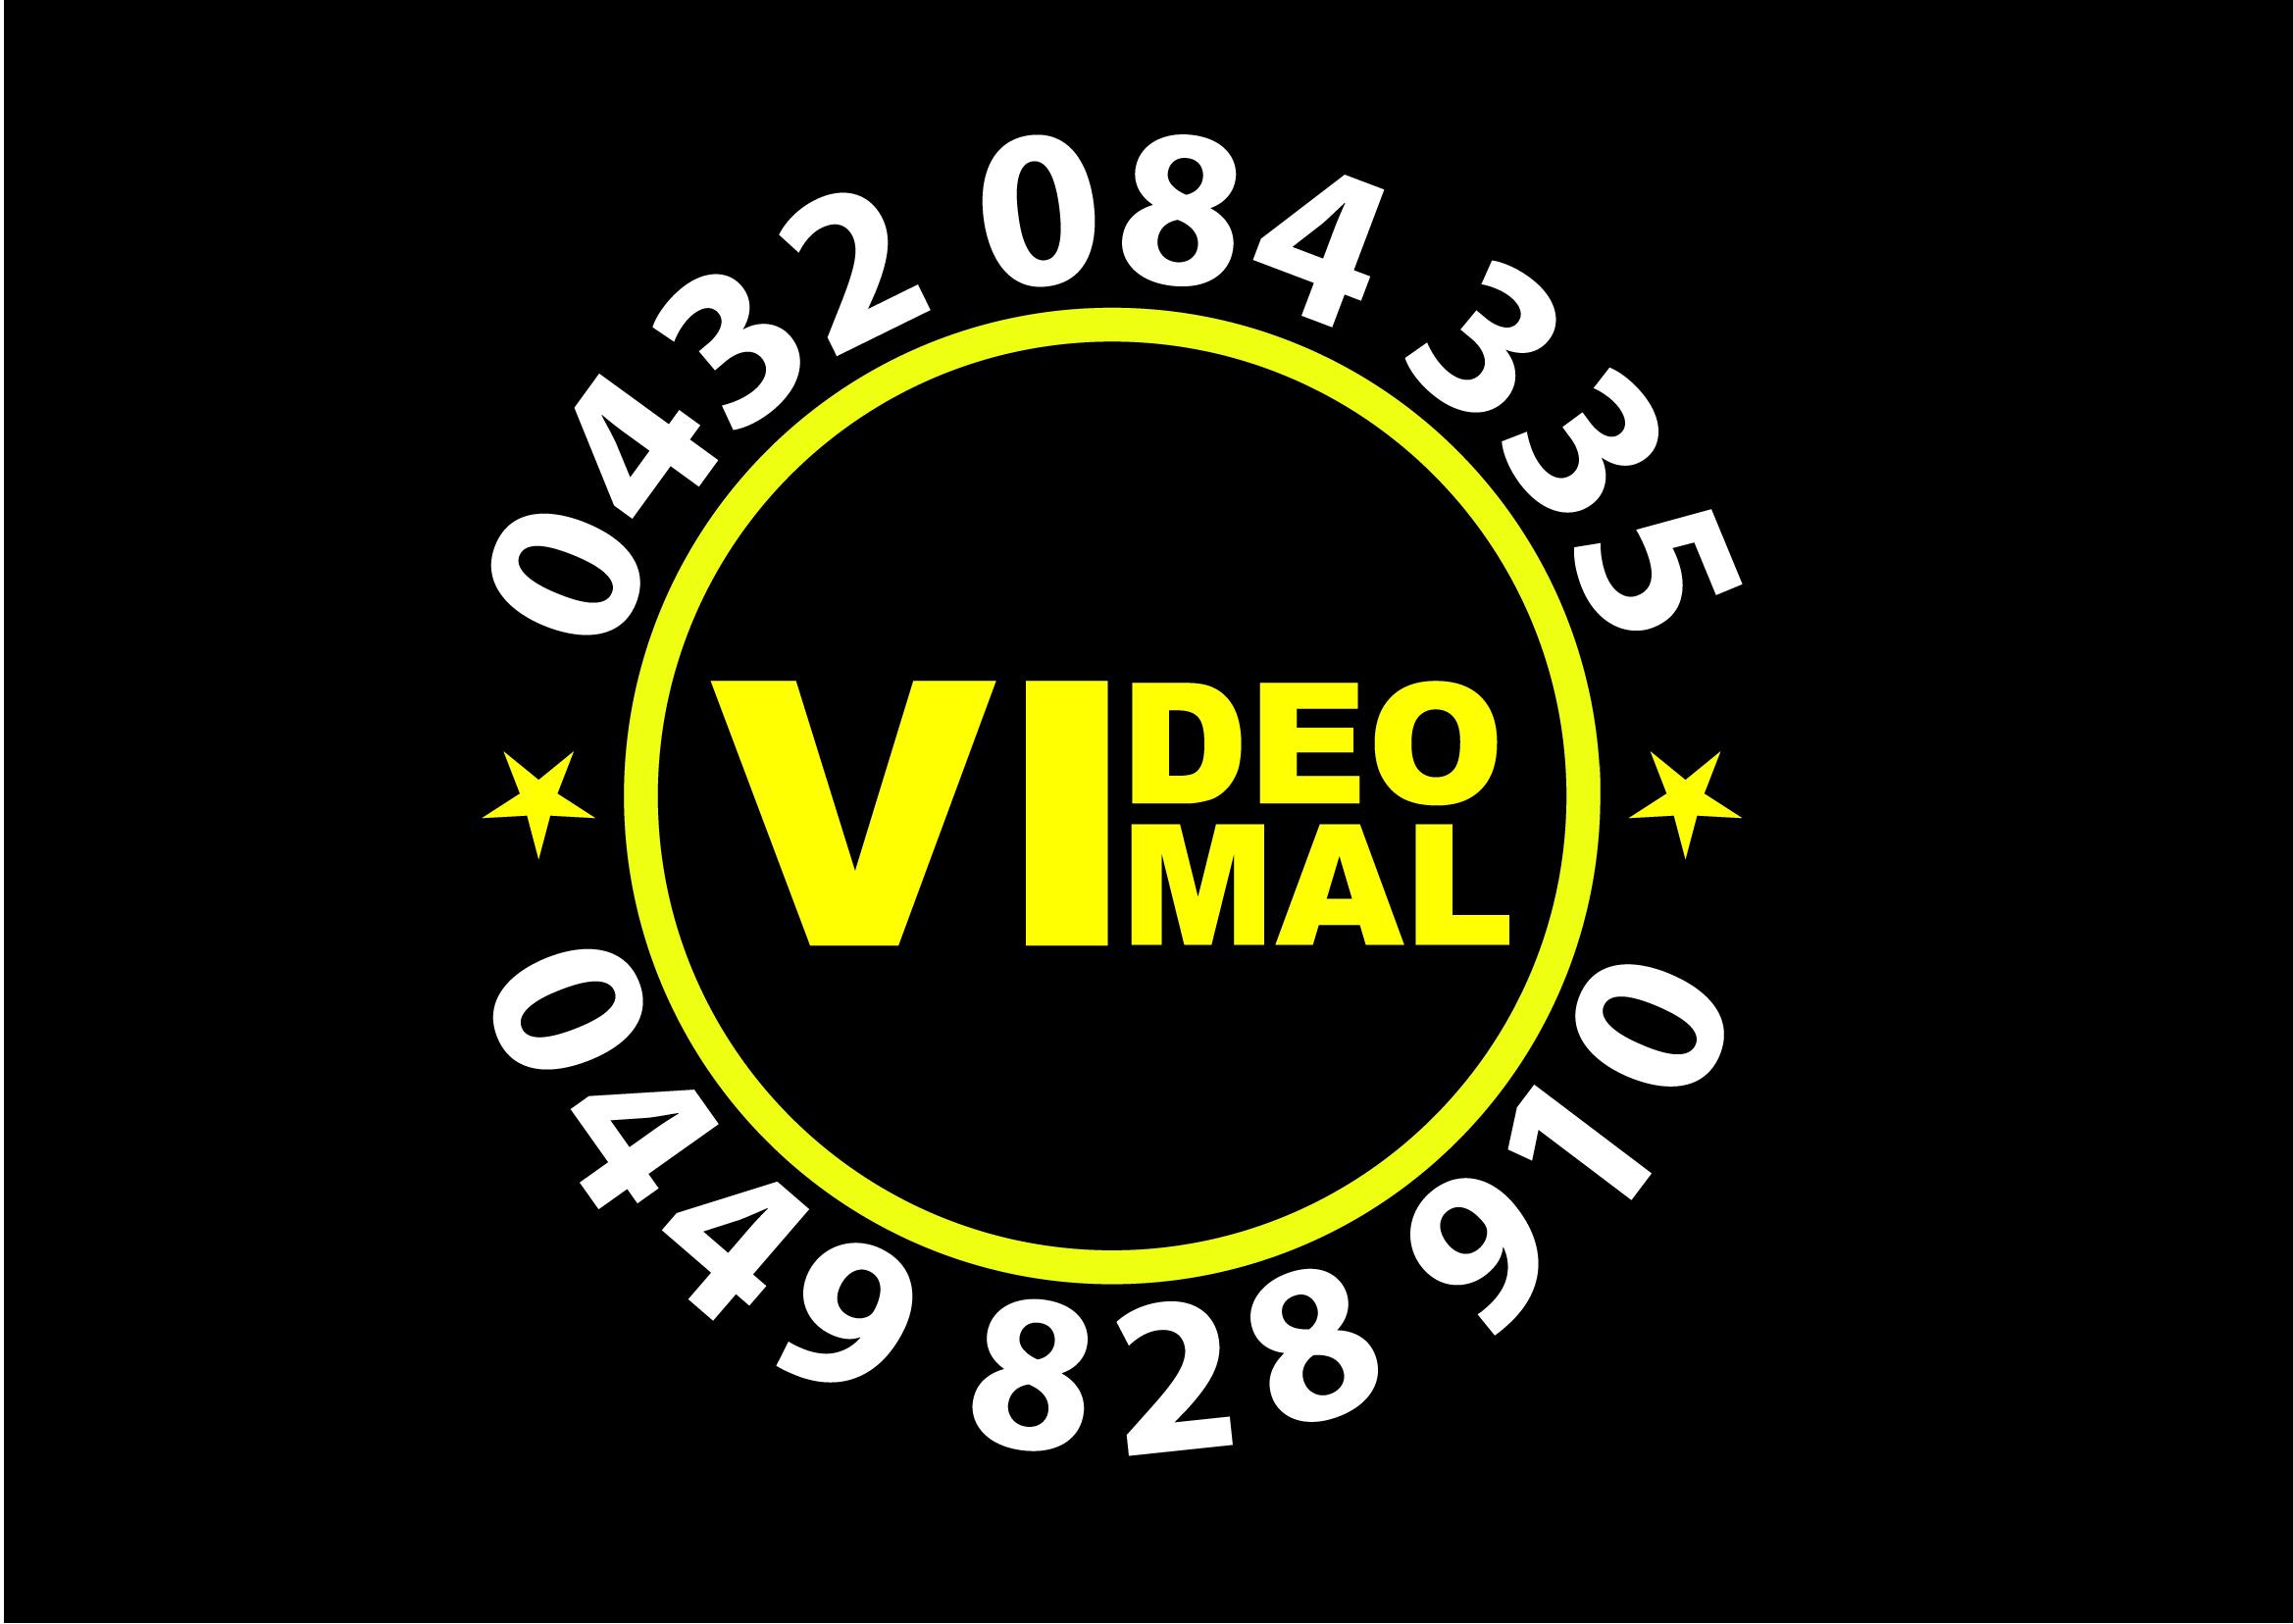 VIDEO VIMAL LOGO - Two Numbers